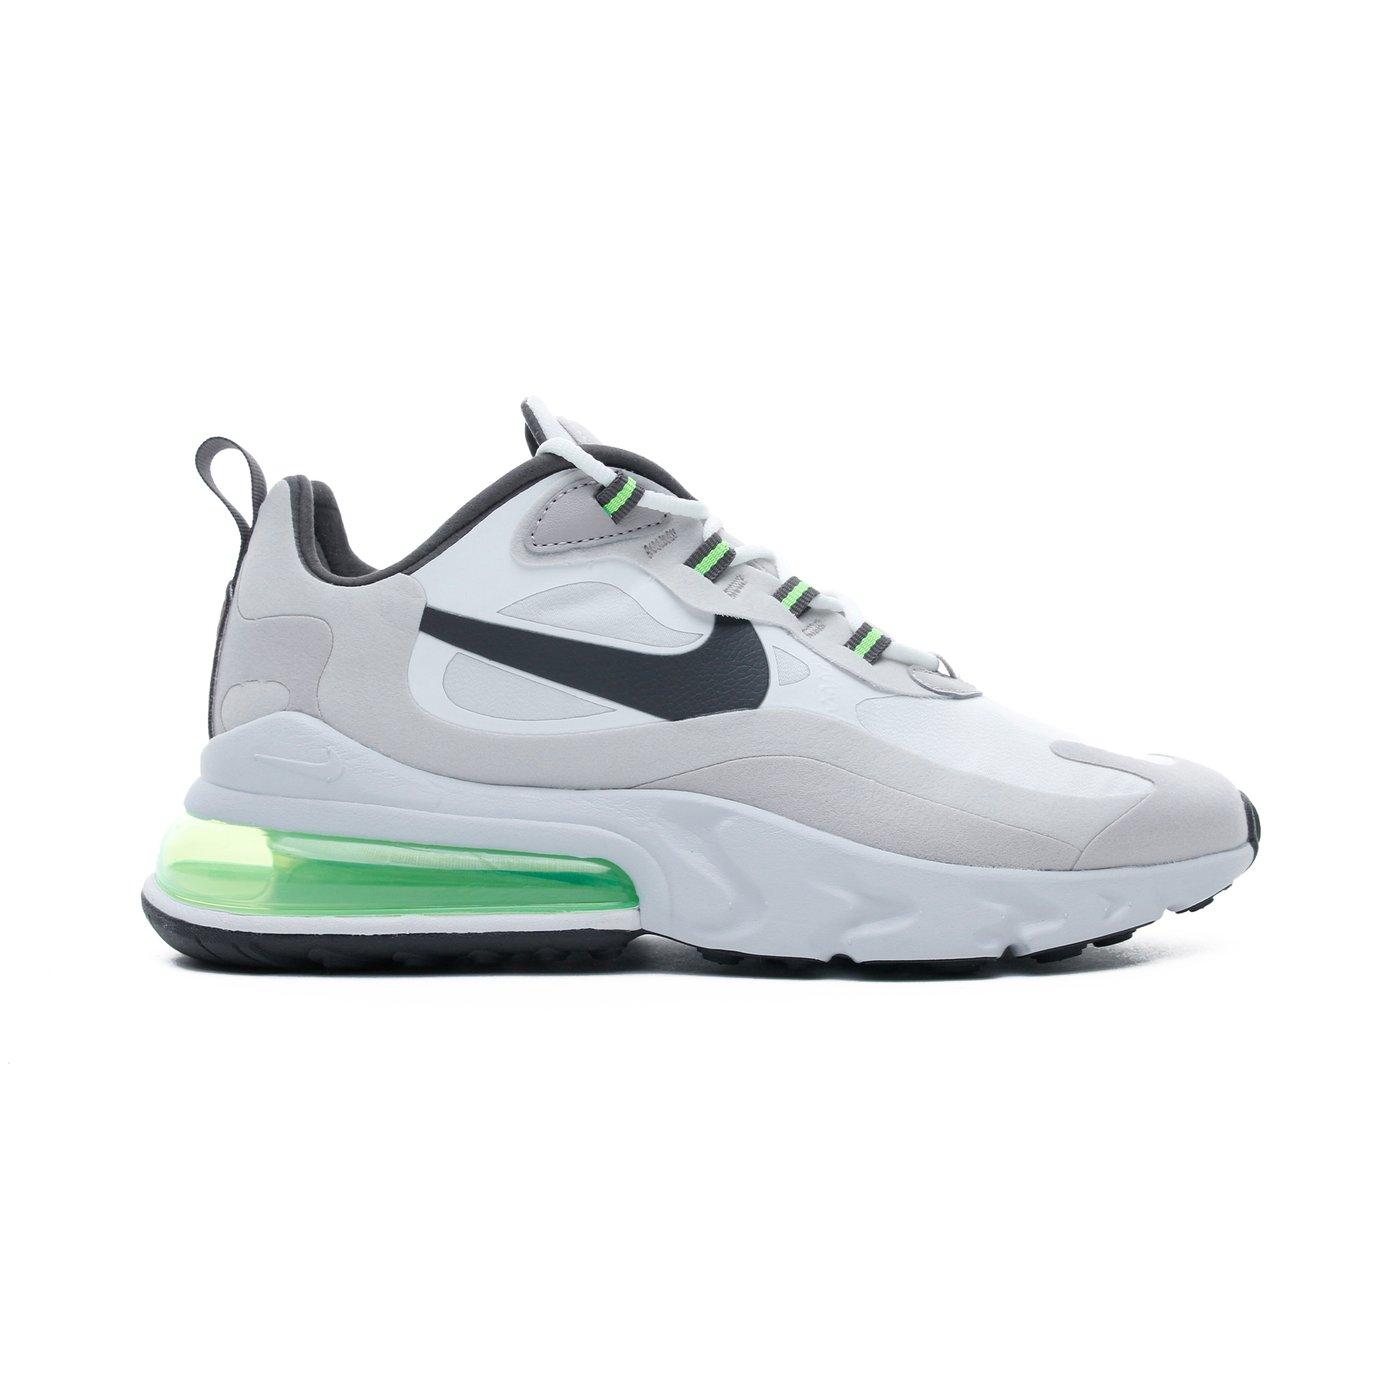 Nike Air Max 270 React Erkek Beyaz Spor Ayakkabı